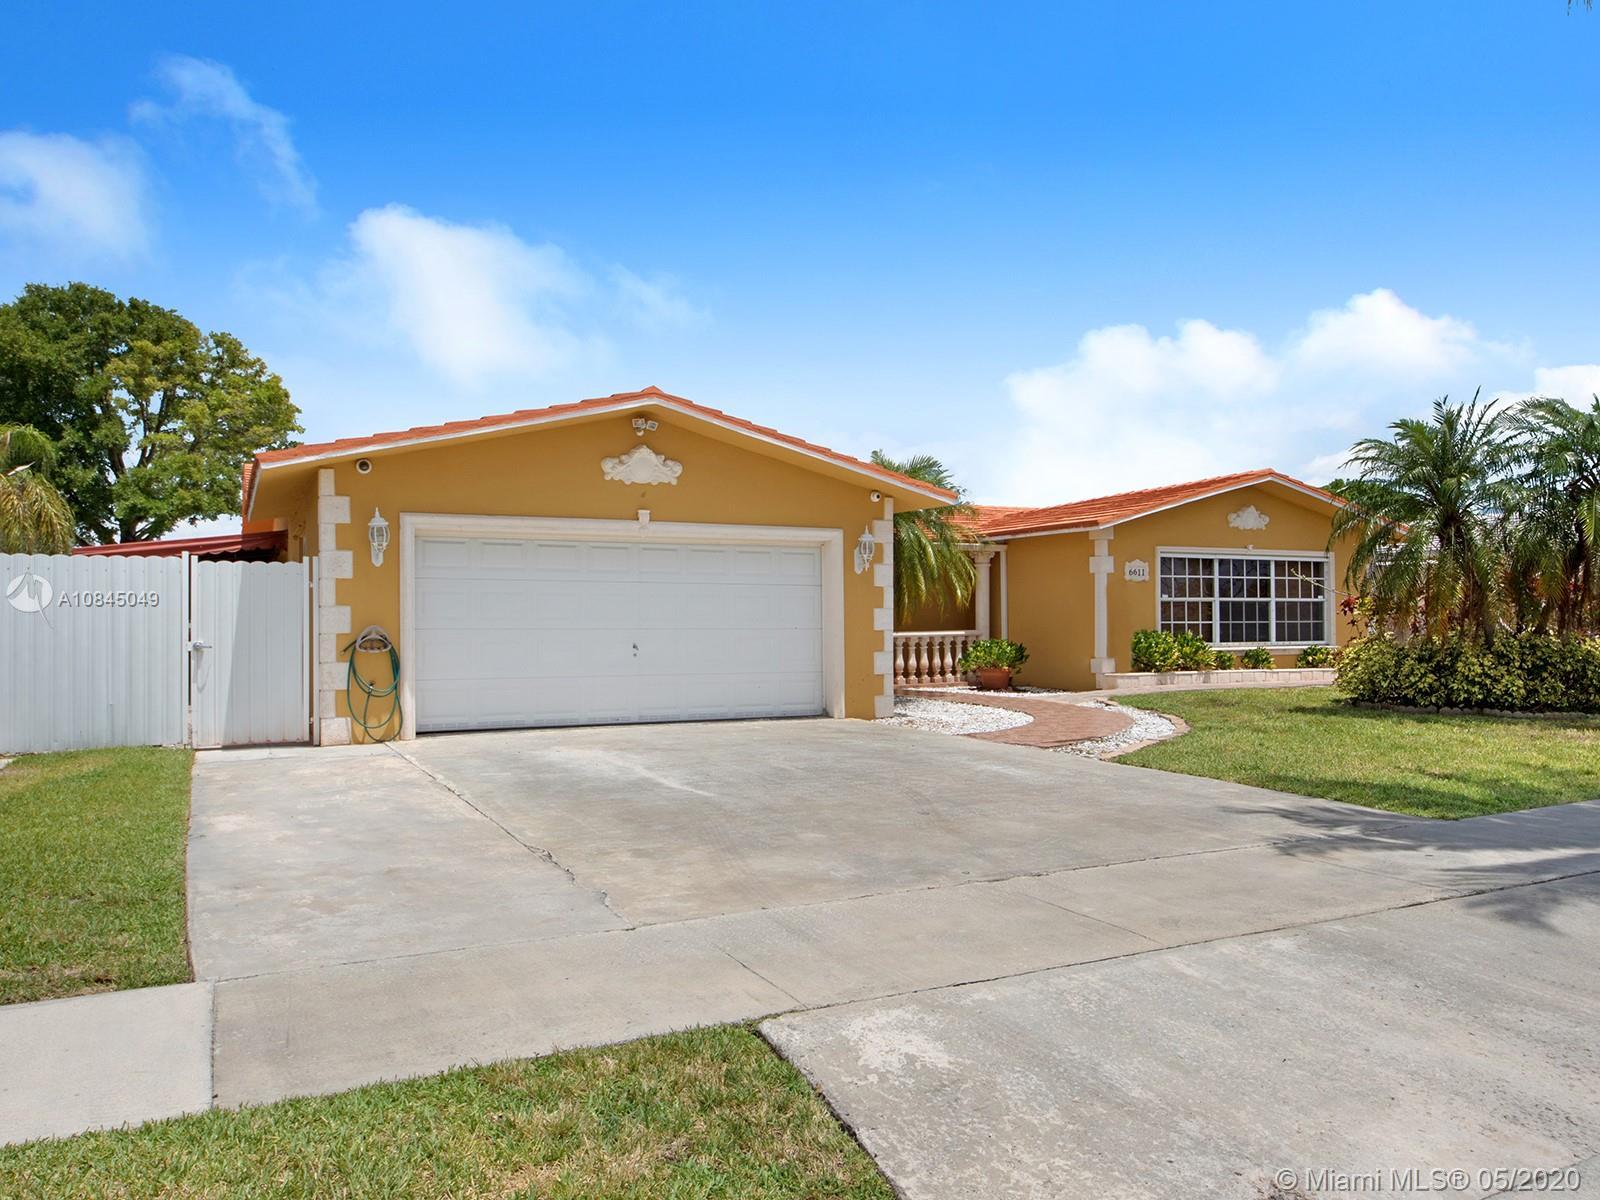 6611 Royal Palm Blvd, Margate, FL 33063